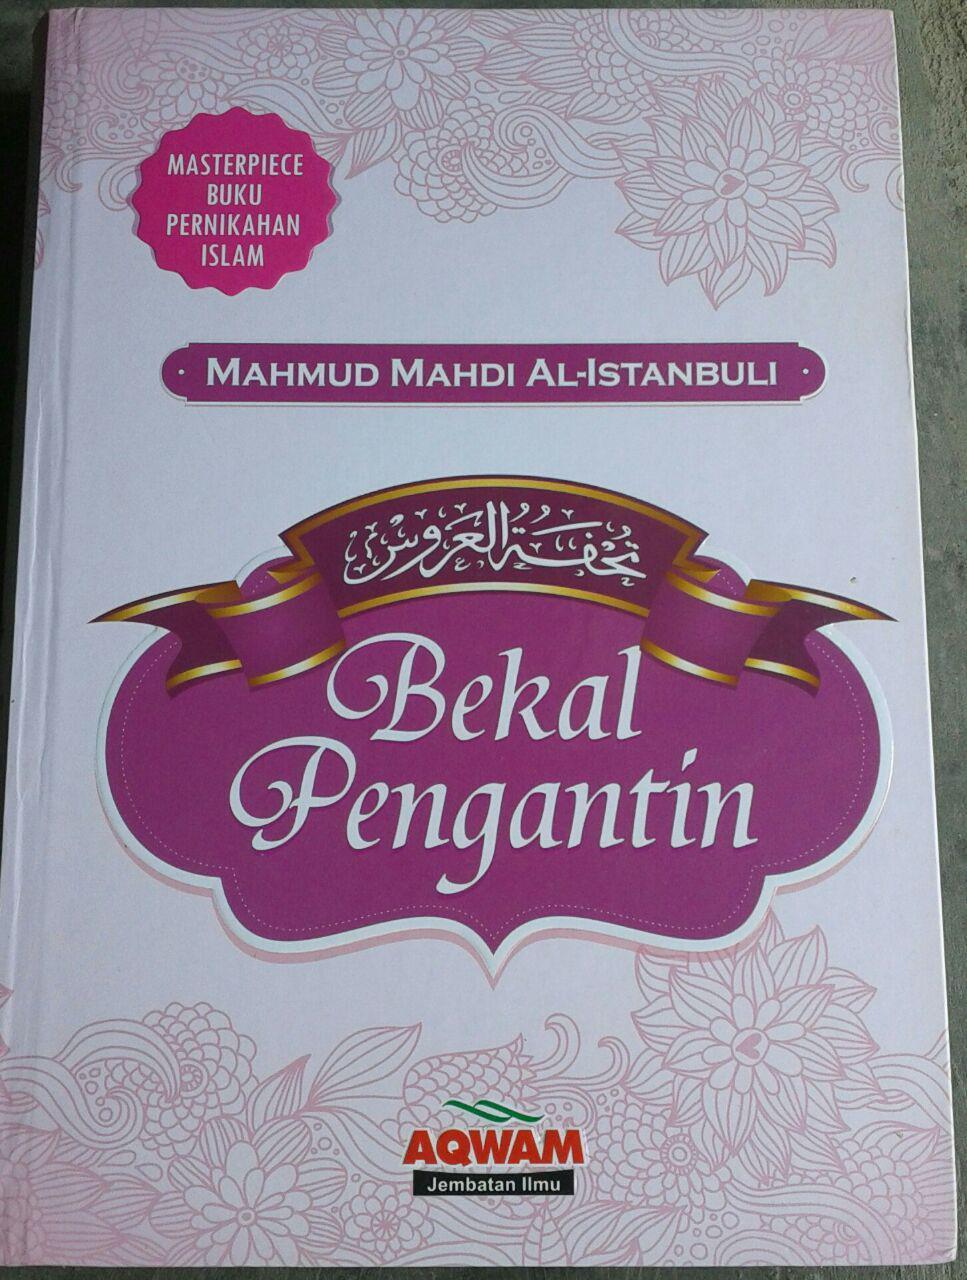 Buku Masterpiece Pernikahan Islam Bekal Pengantin cover 2